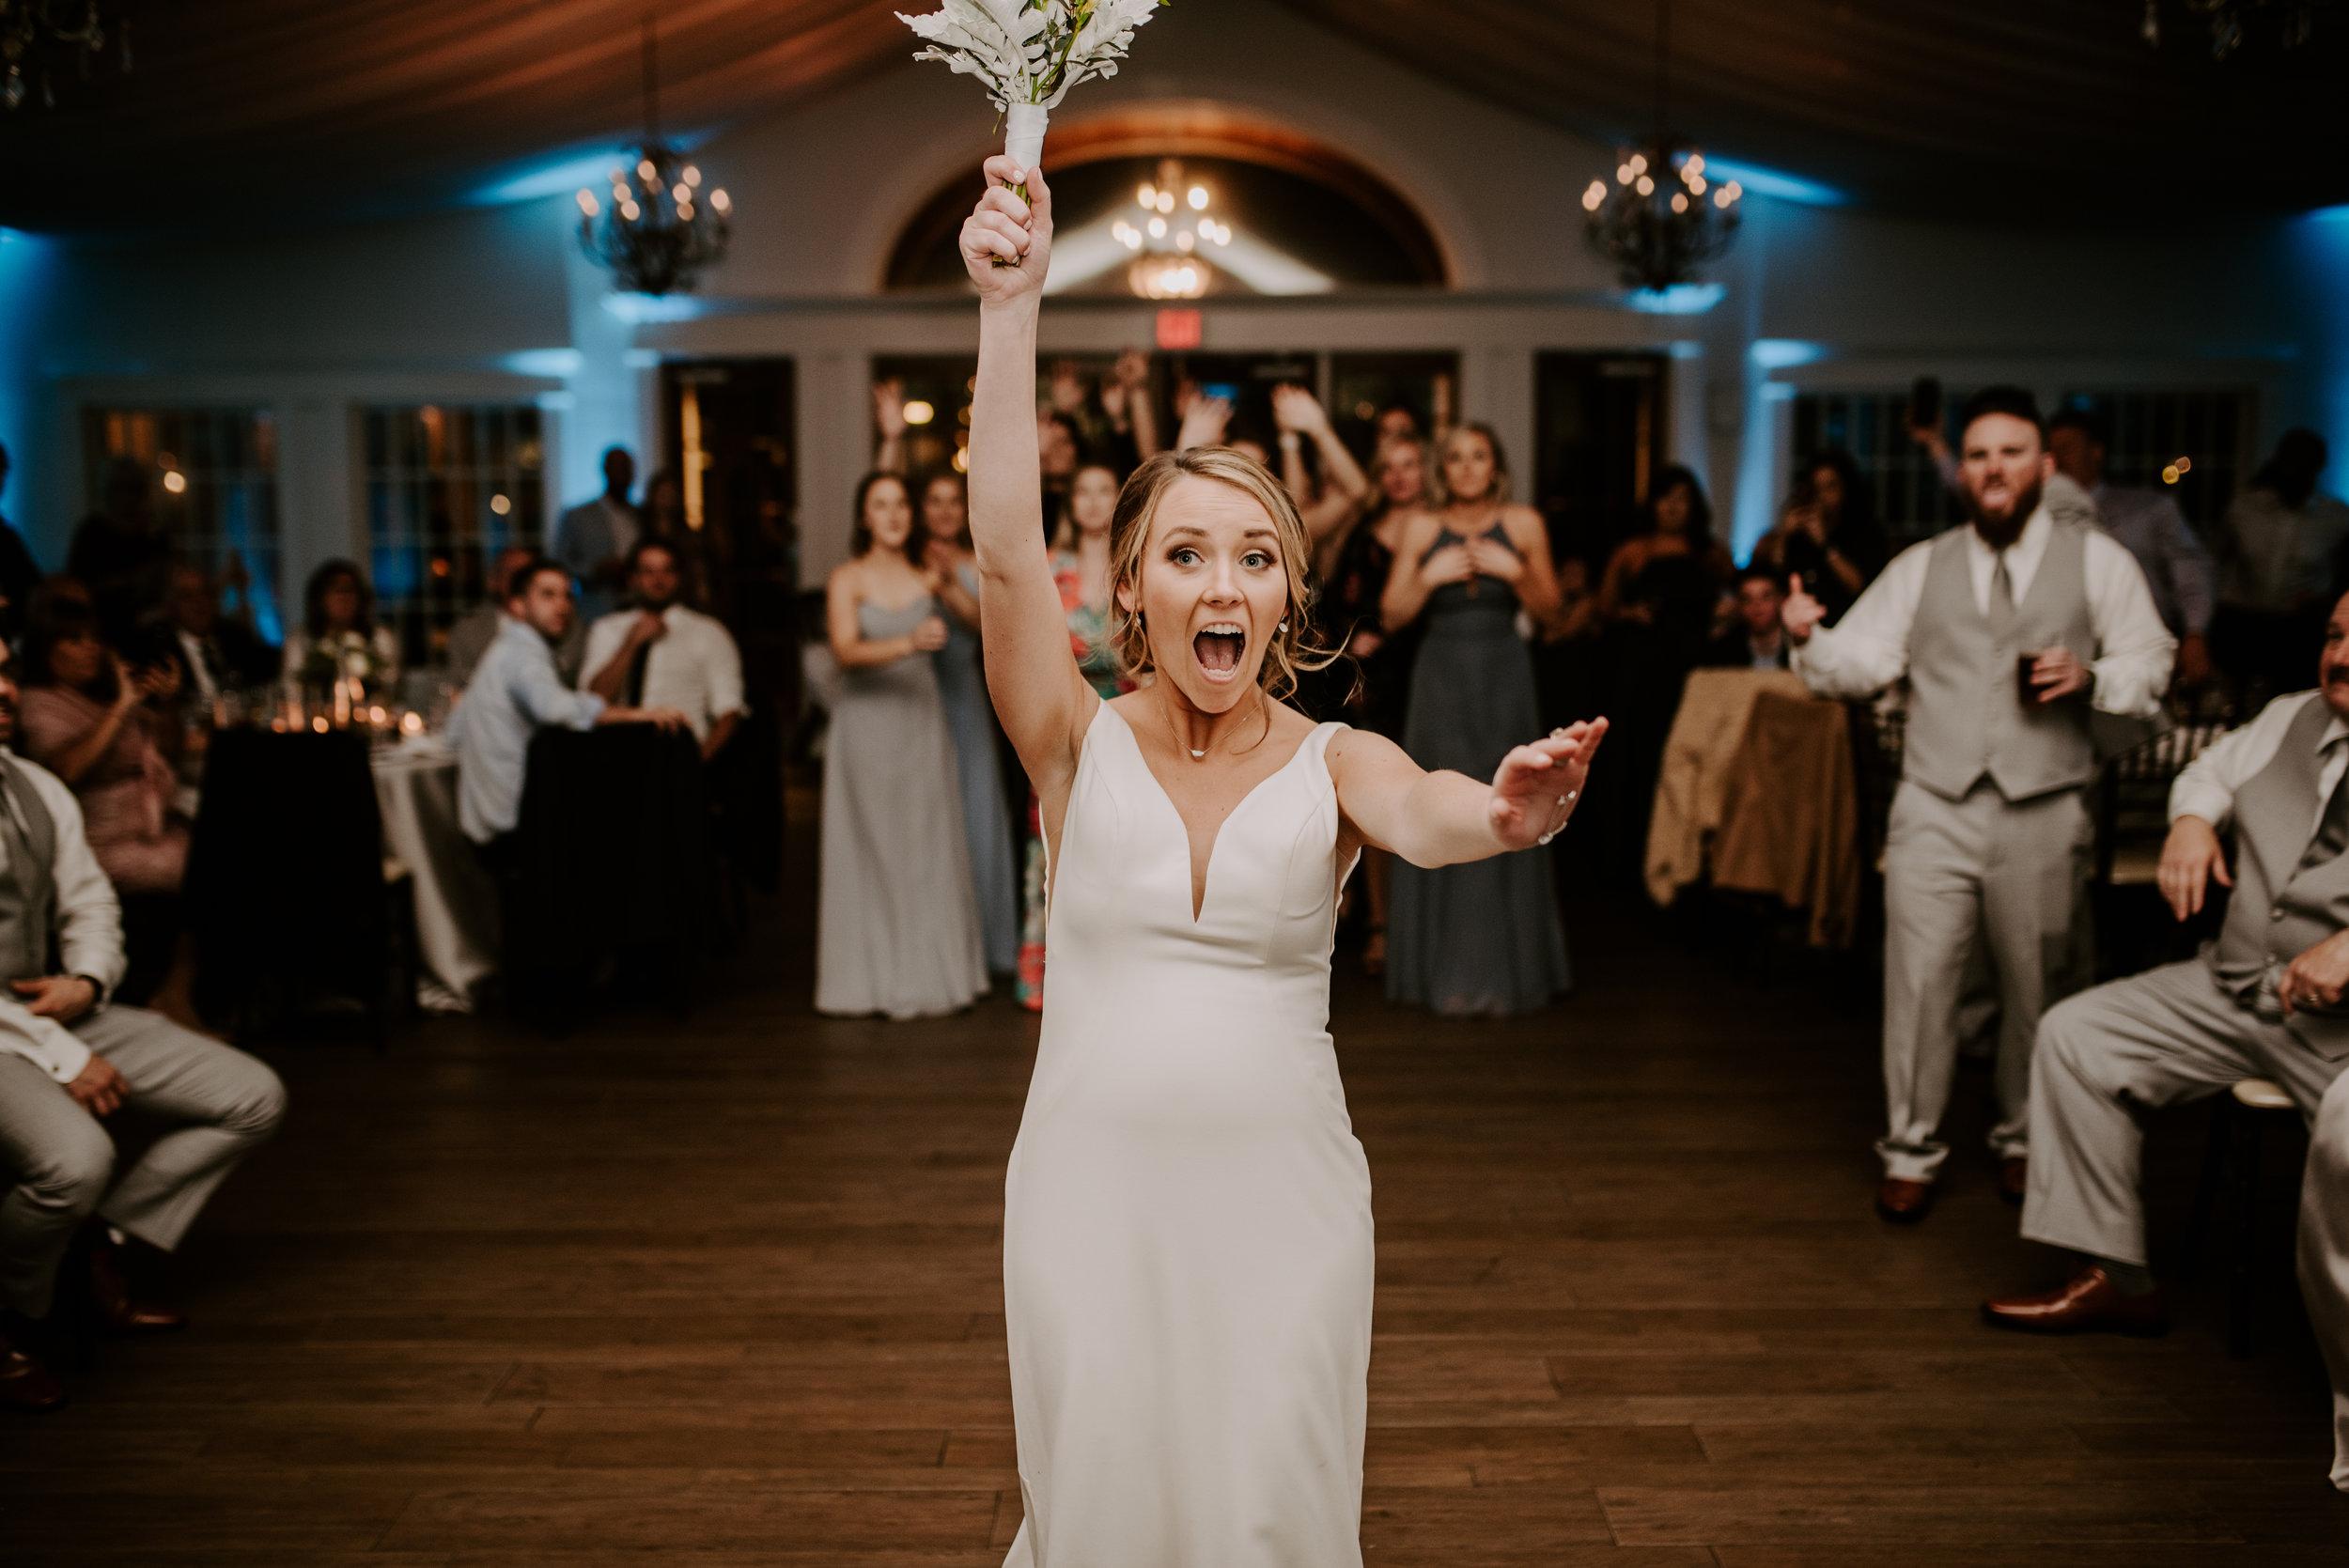 Highgrove Estates Wedding - Raleigh Wedding Photographer - North Carolina Wedding Photographer